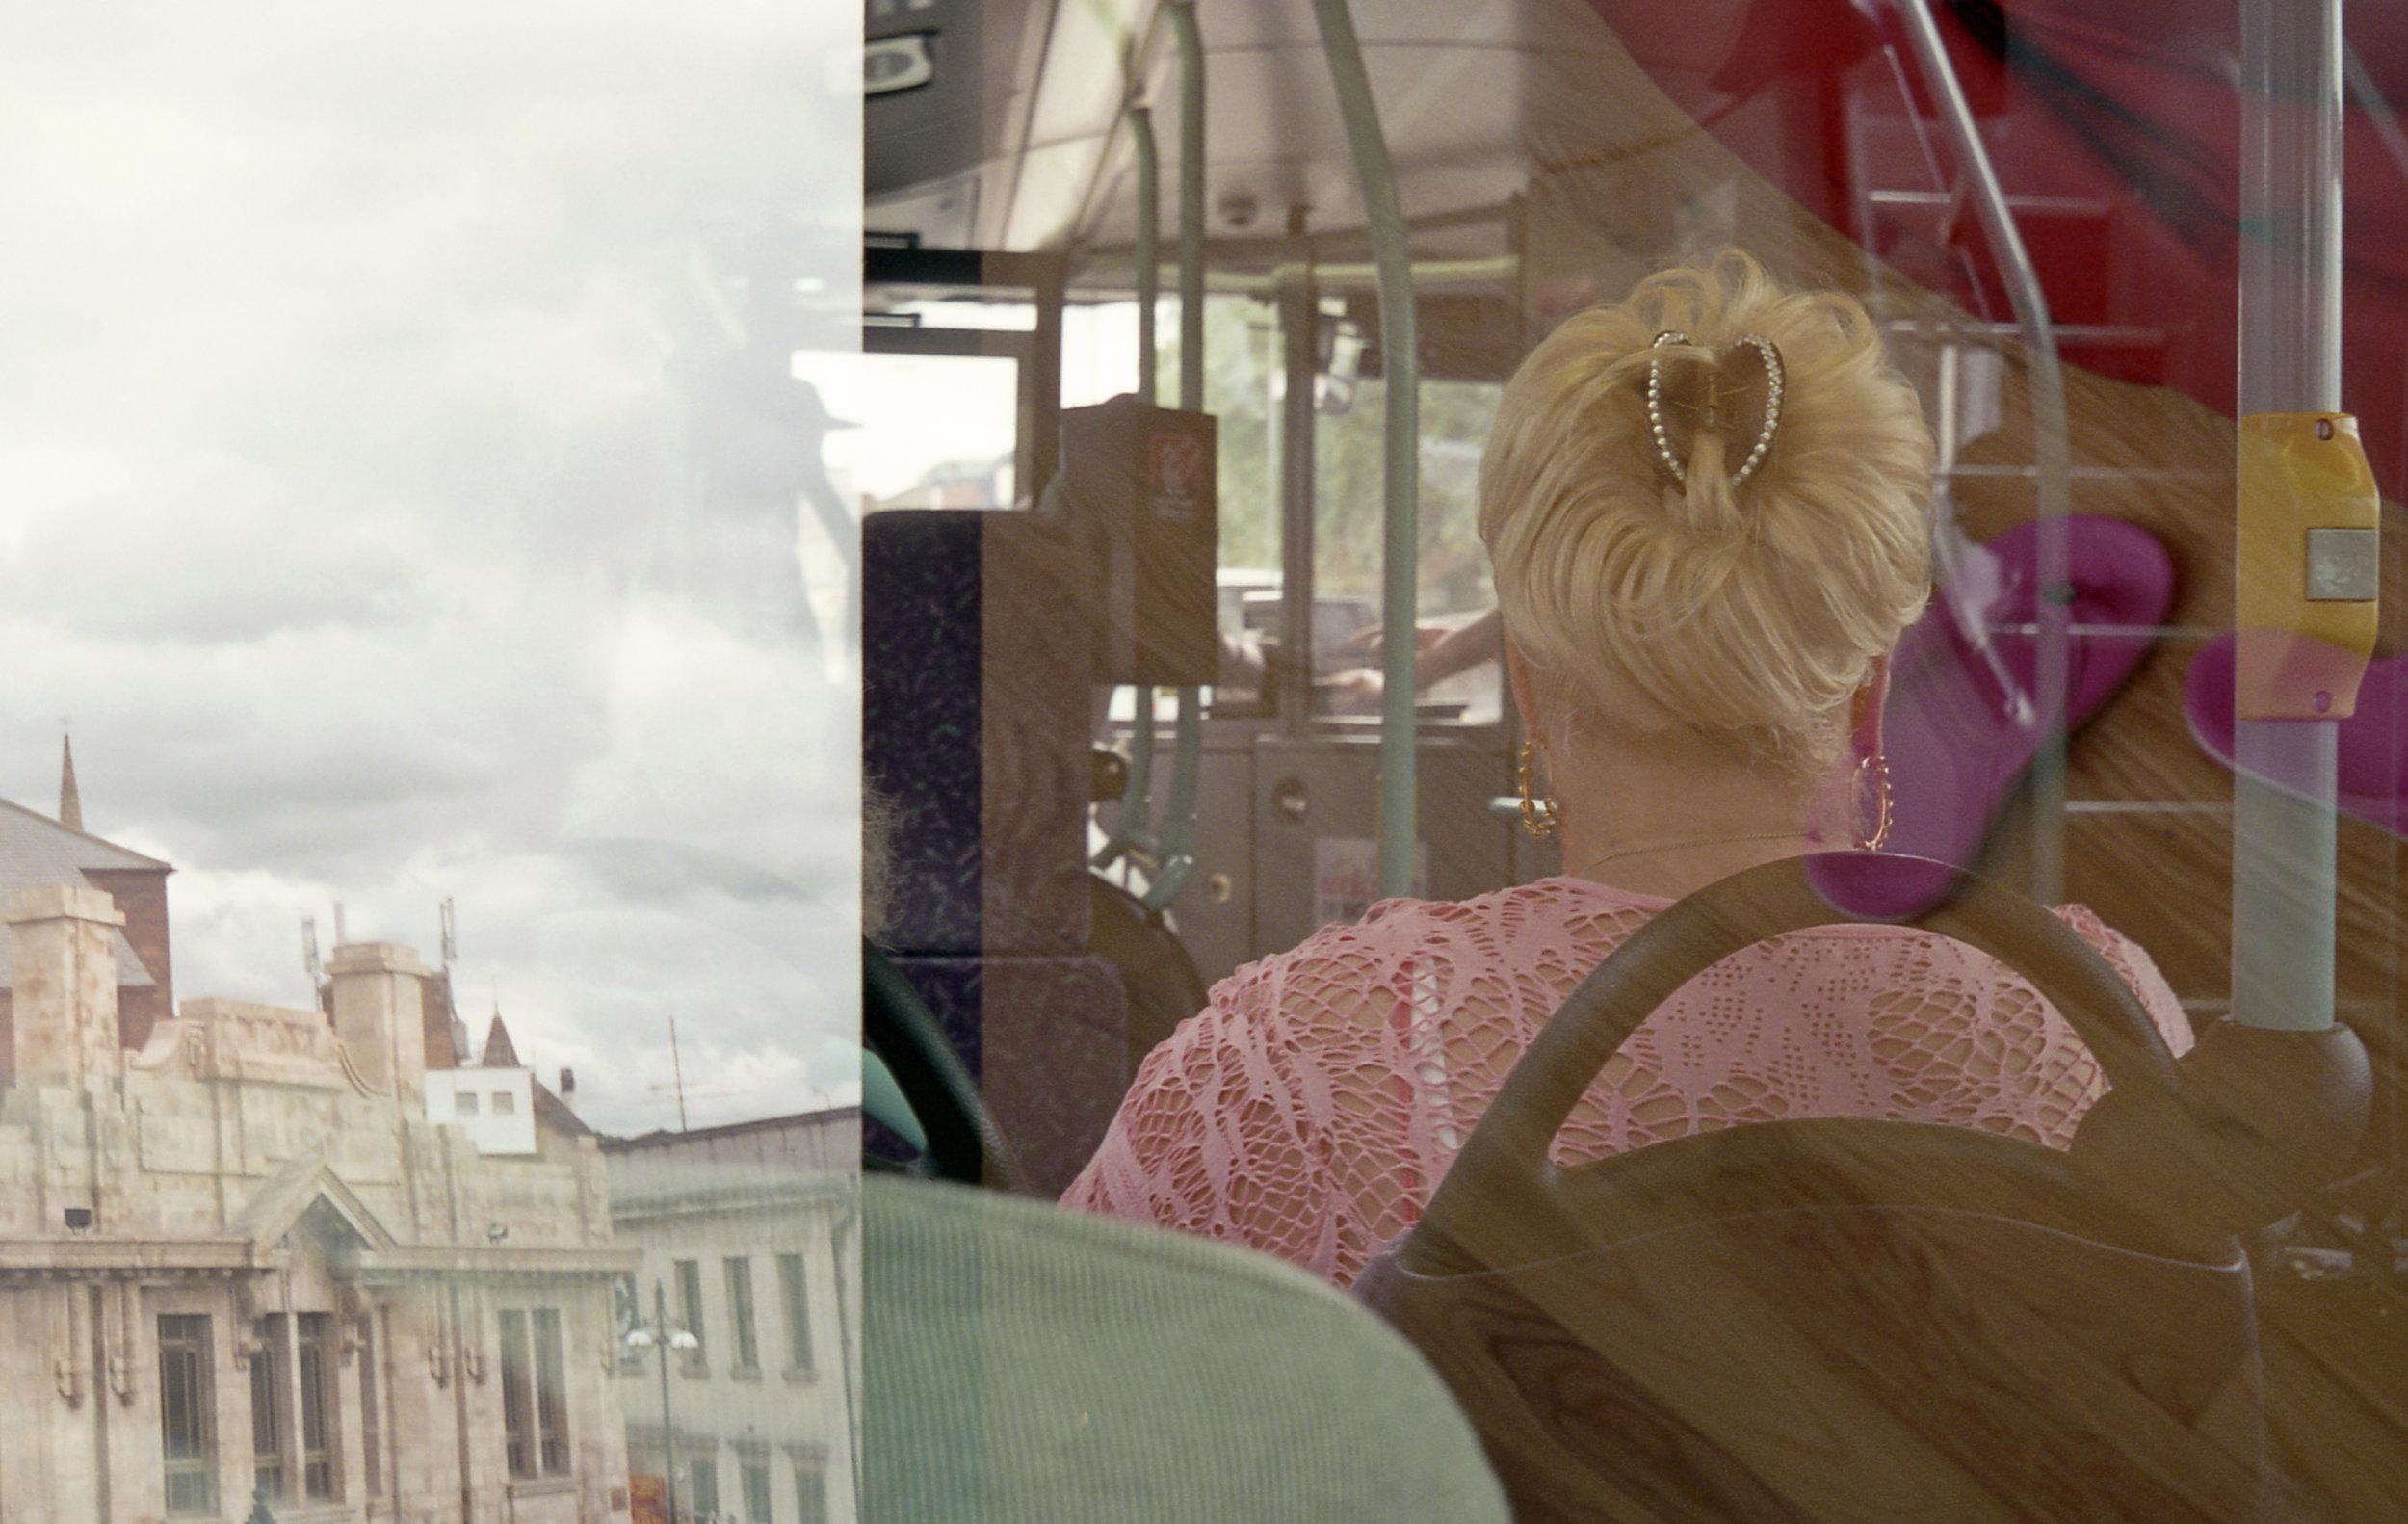 Woman On The Bus.jpg